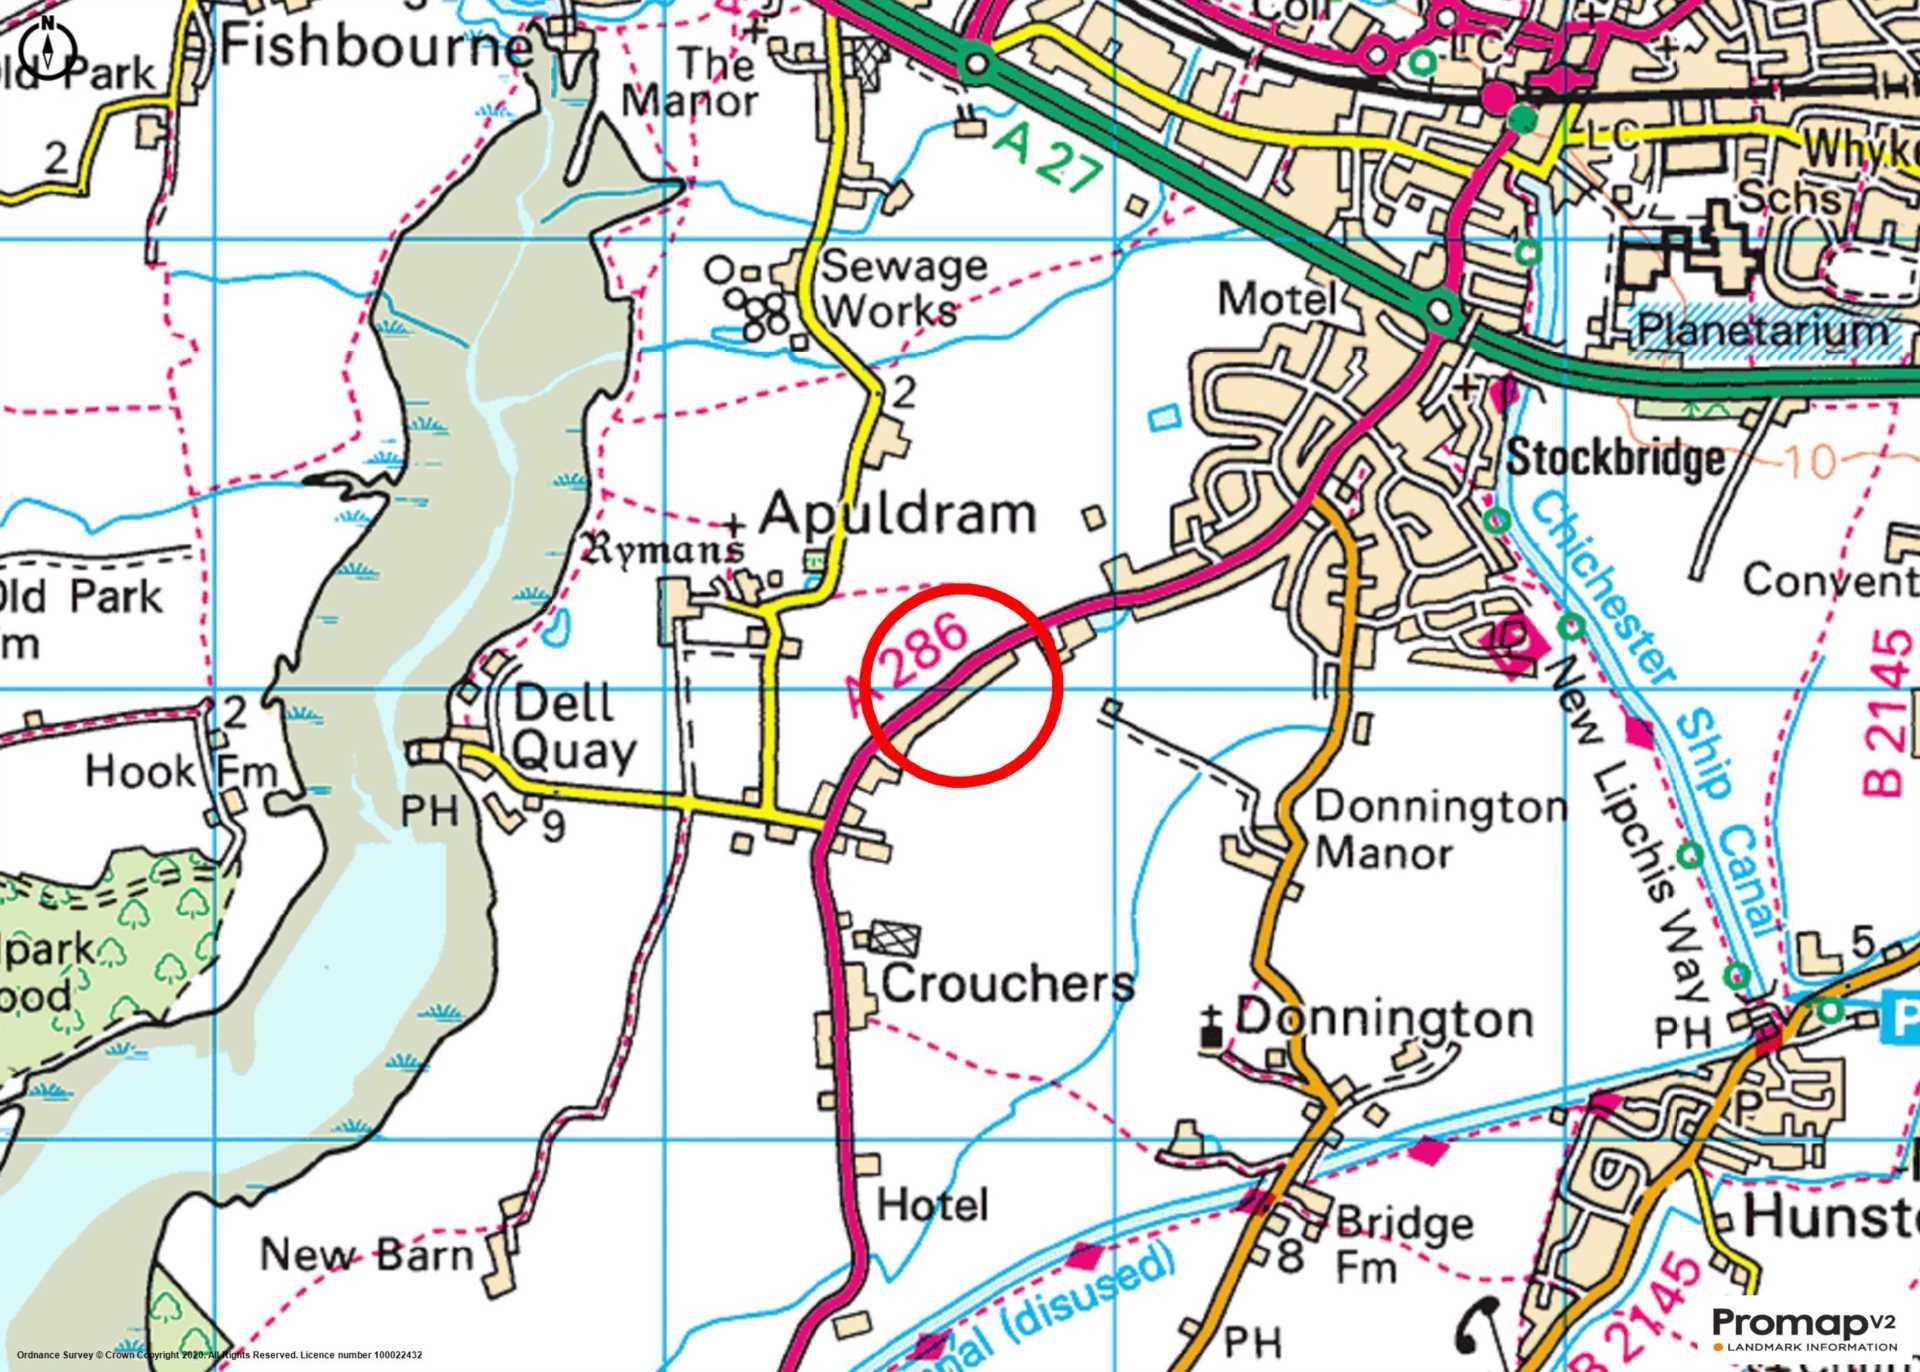 Birdham Road, Donnington, Chichester, Image 17